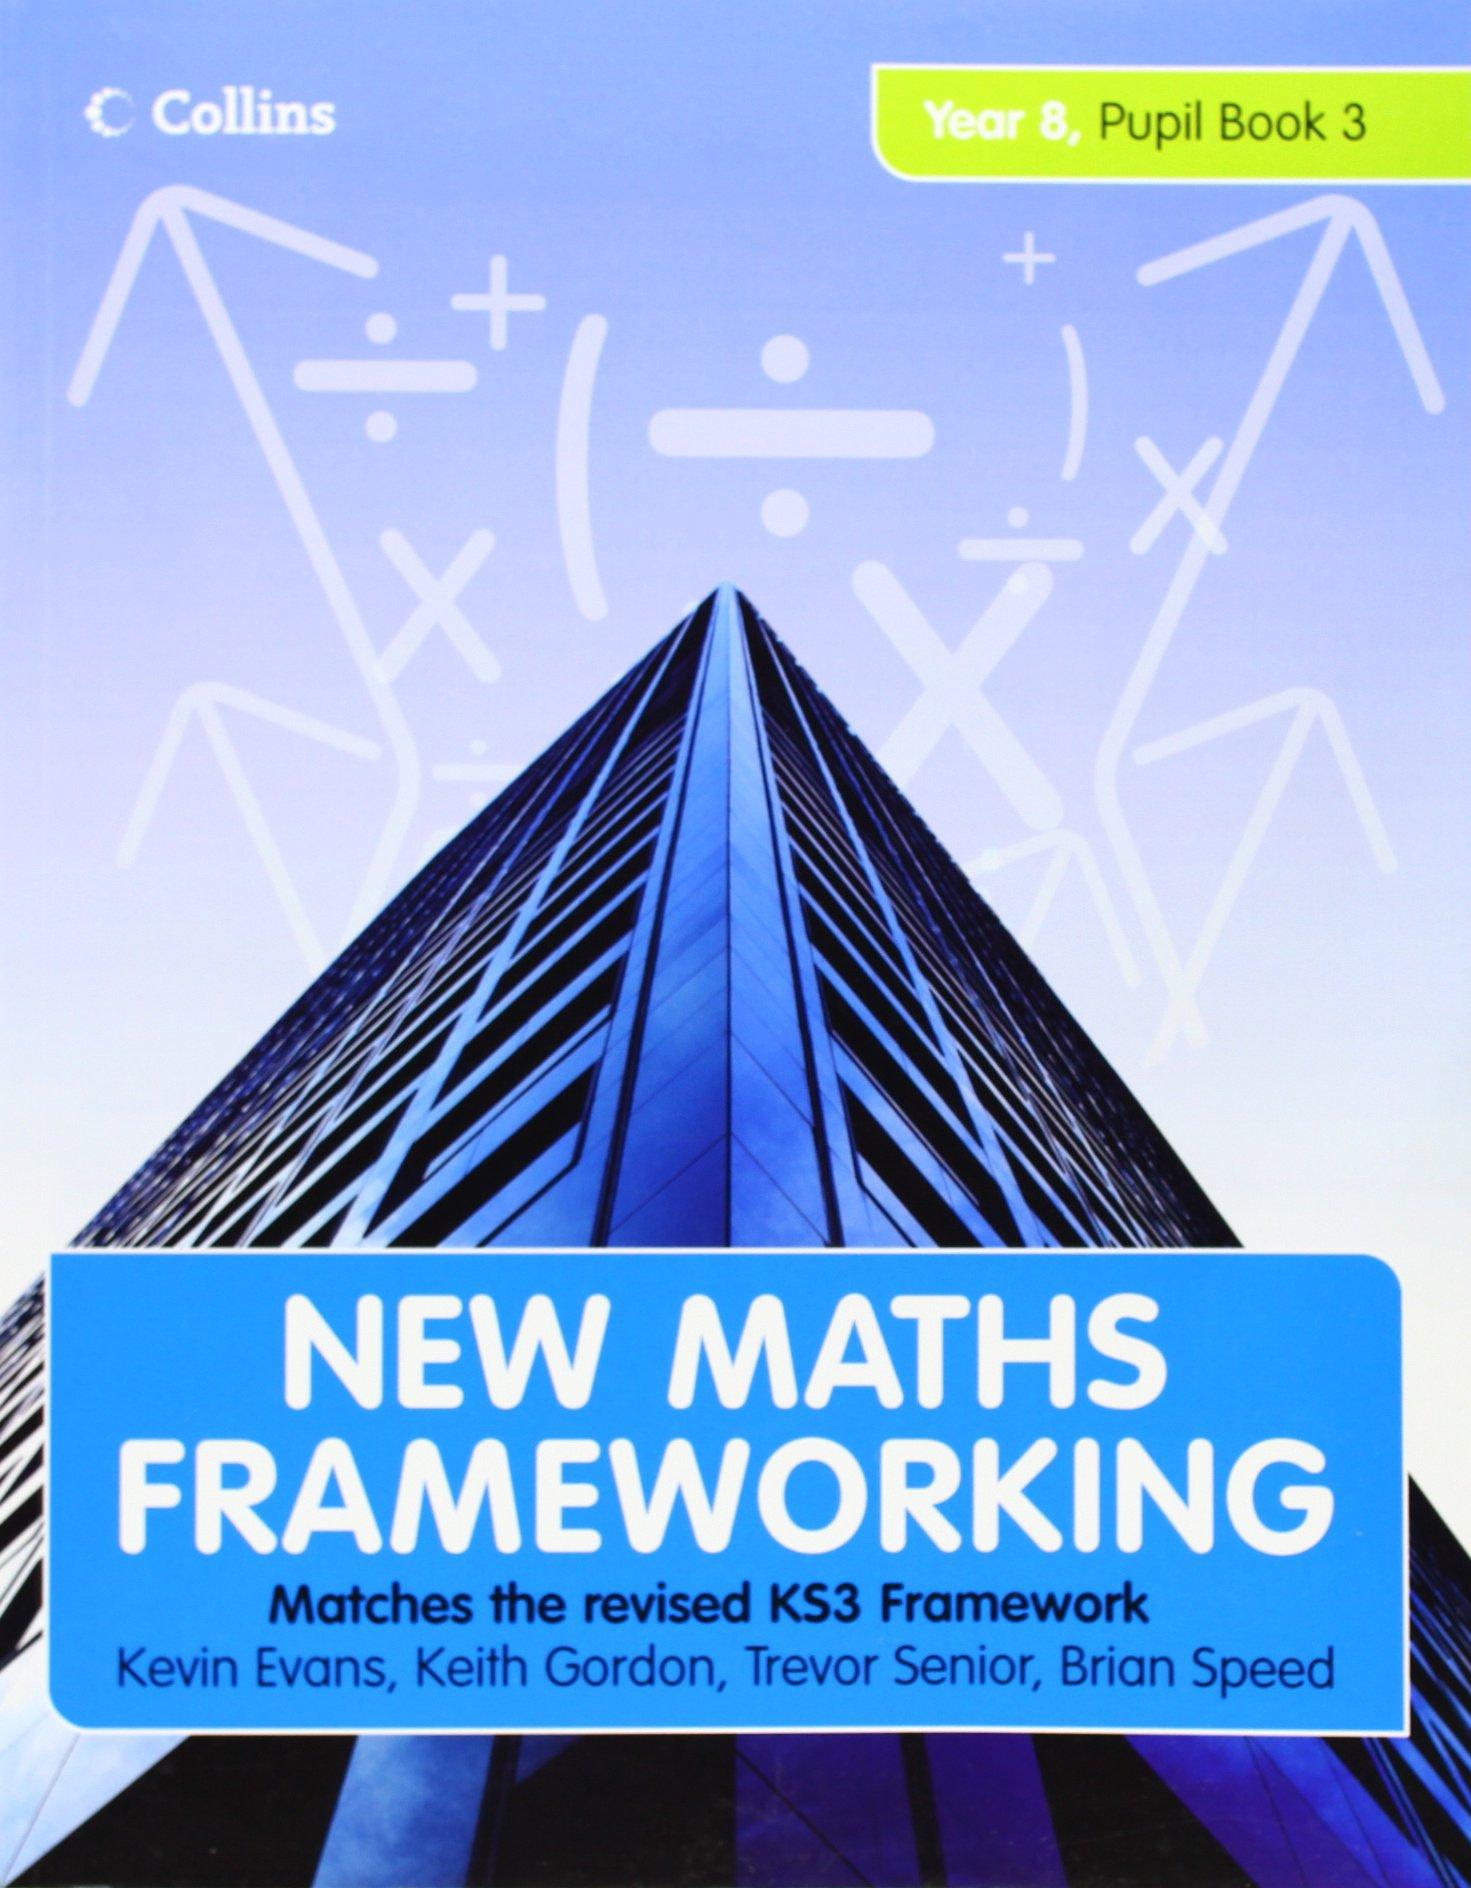 New Maths Frameworking - Year 8 Pupil Book 3 (Levels 6-7): Pupil ...